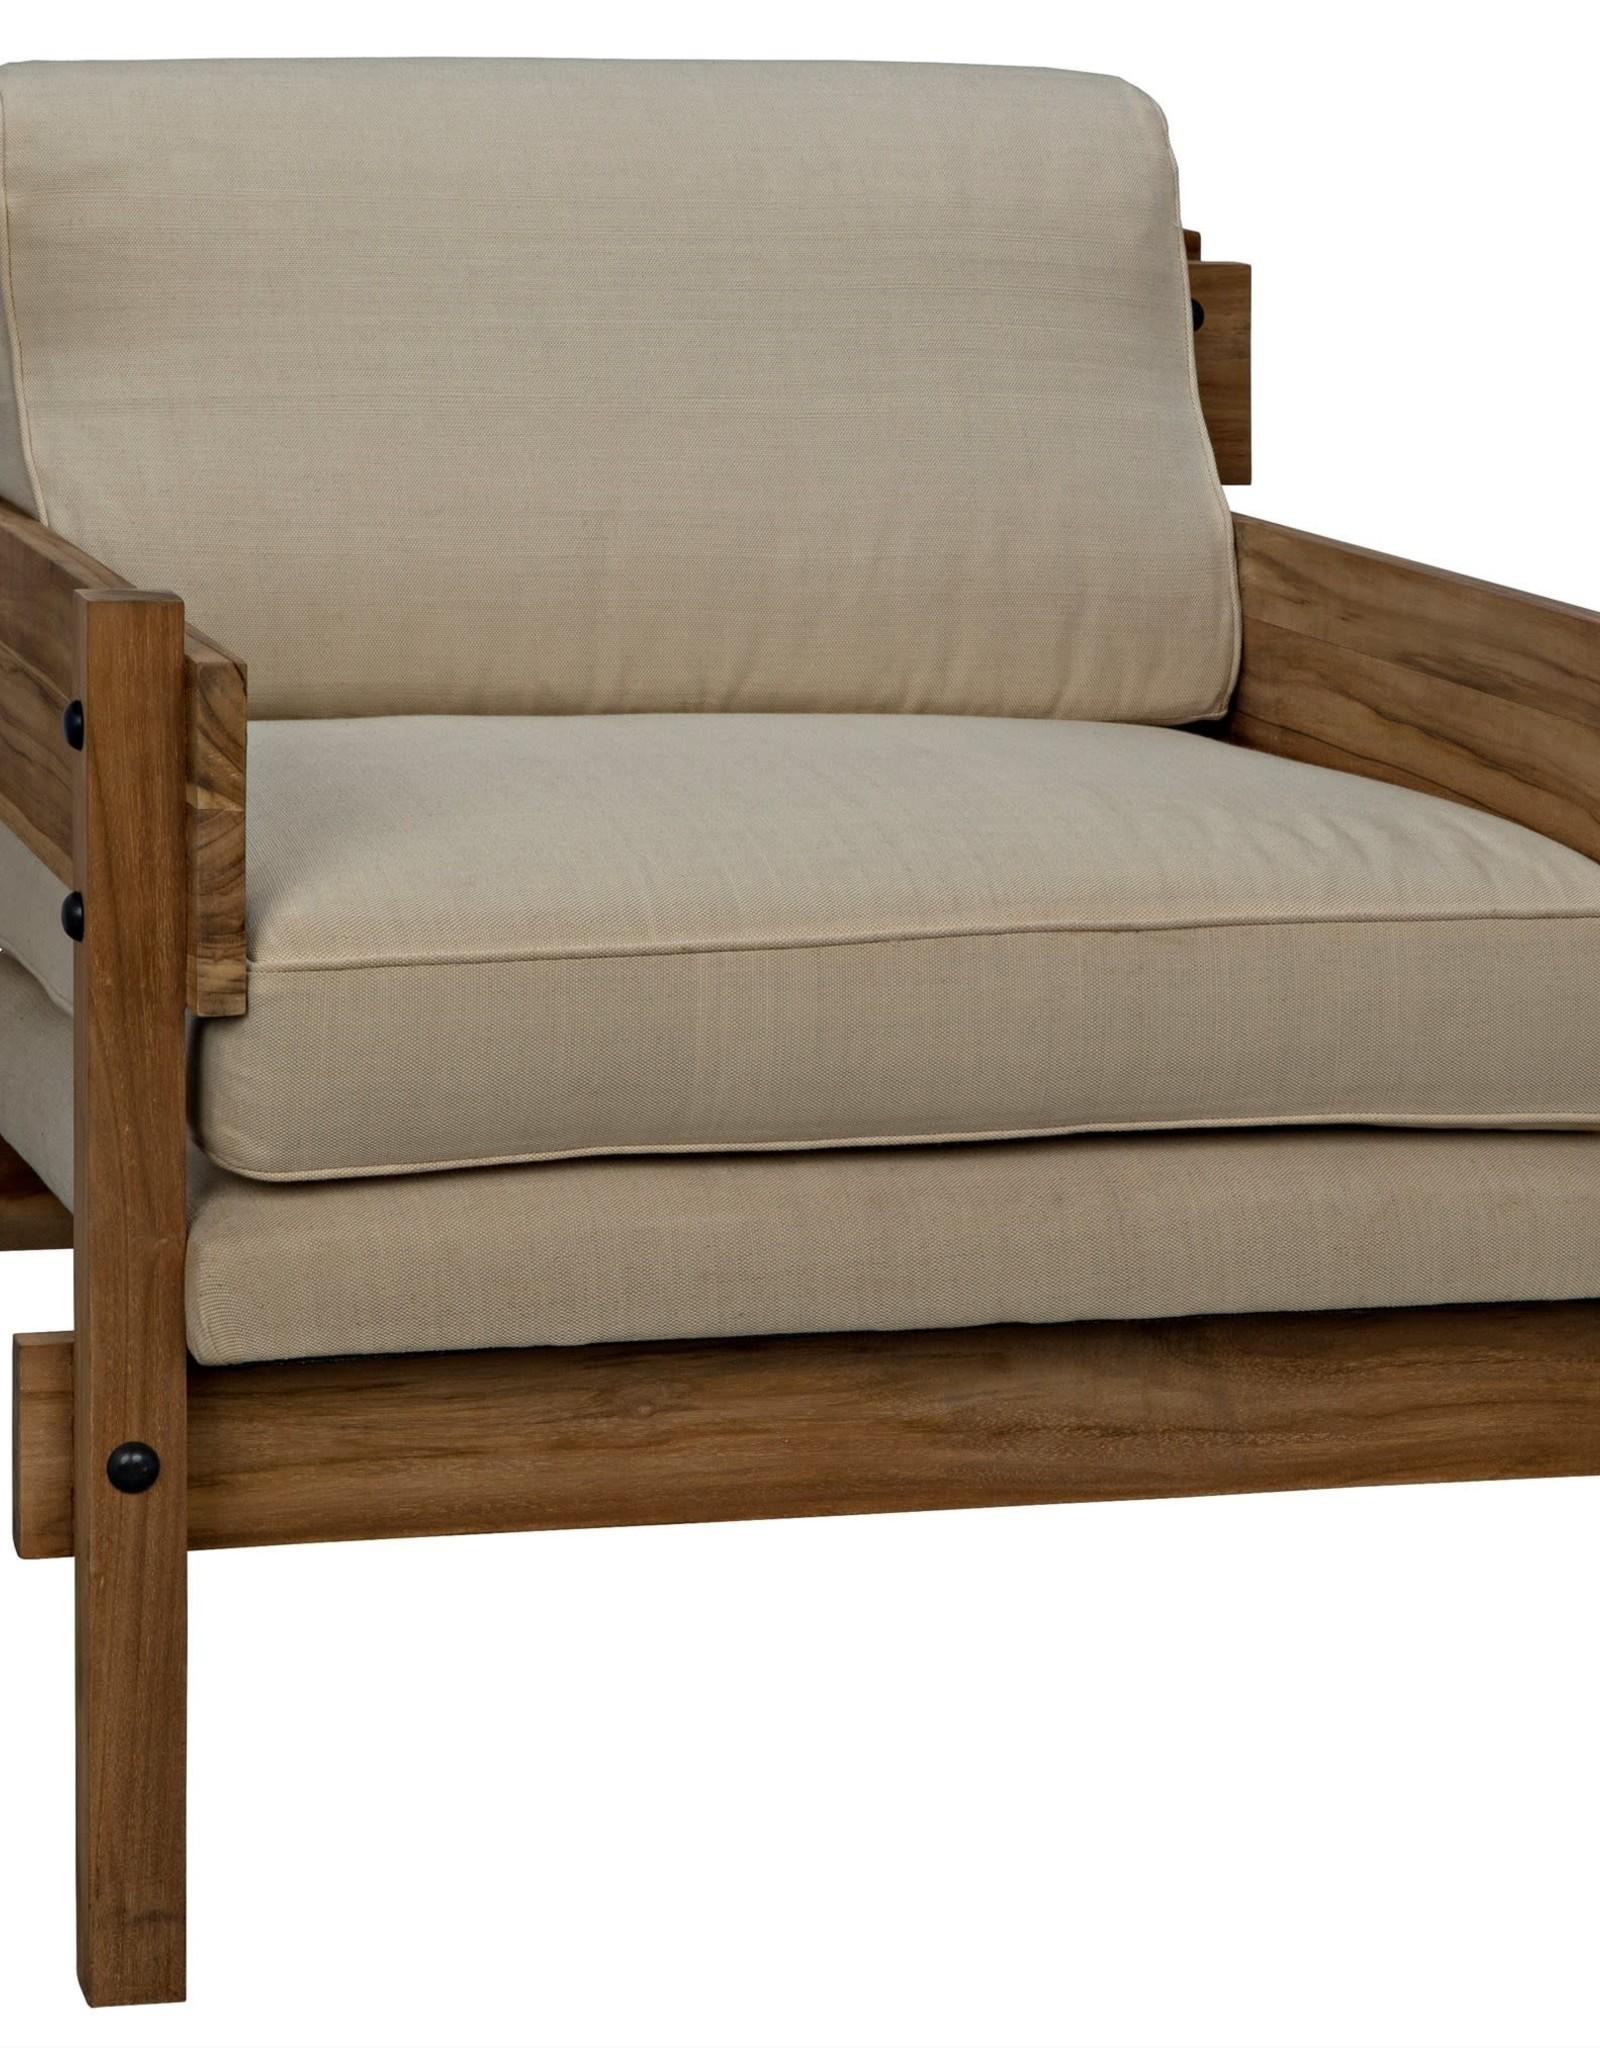 Website Chalet Chair - Teak